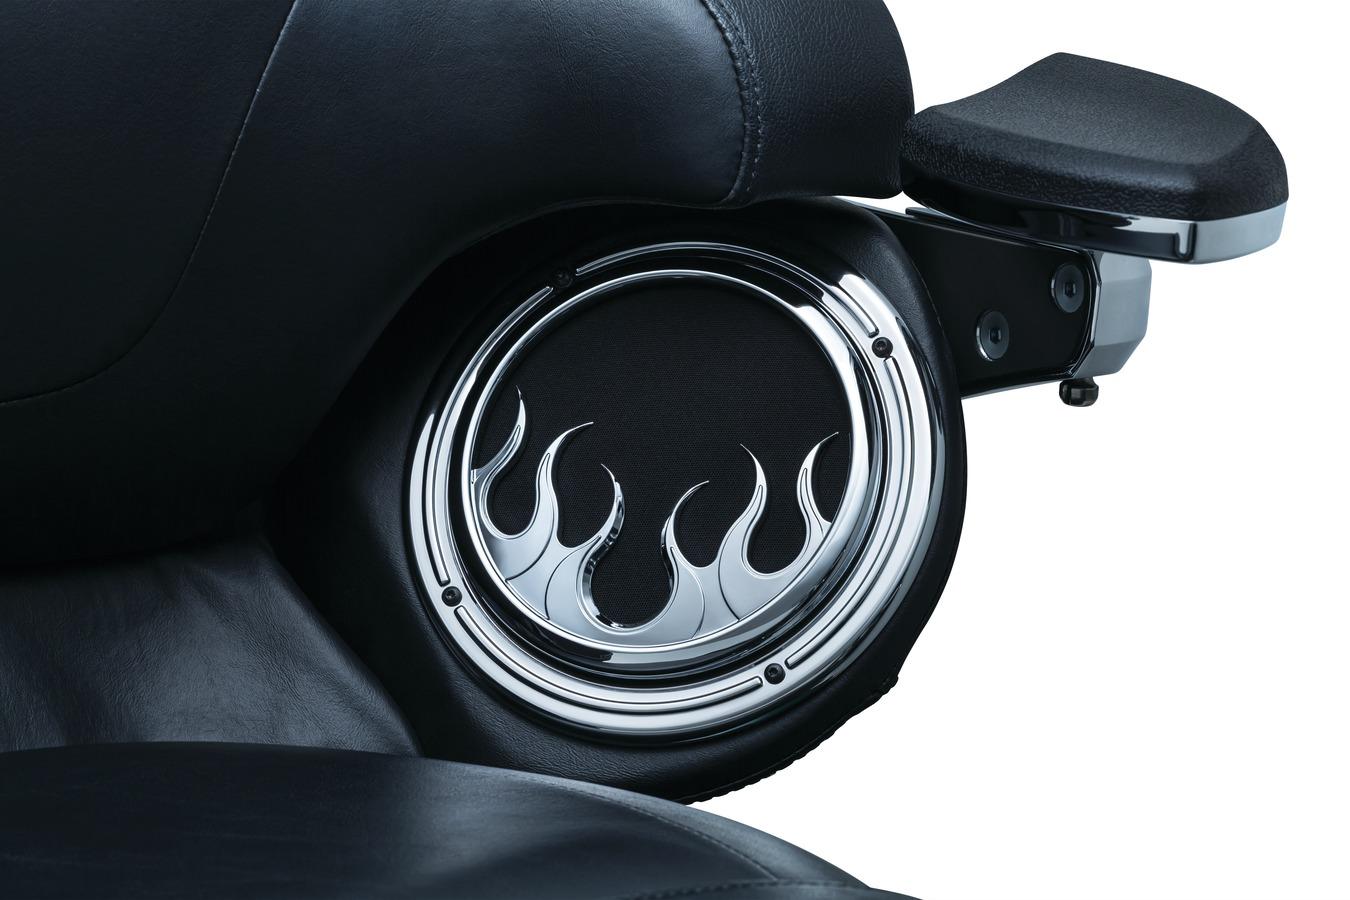 Kuryakyn 7374 Chrome Flame Speaker Grills for 2014-2018 Touring /& Trike